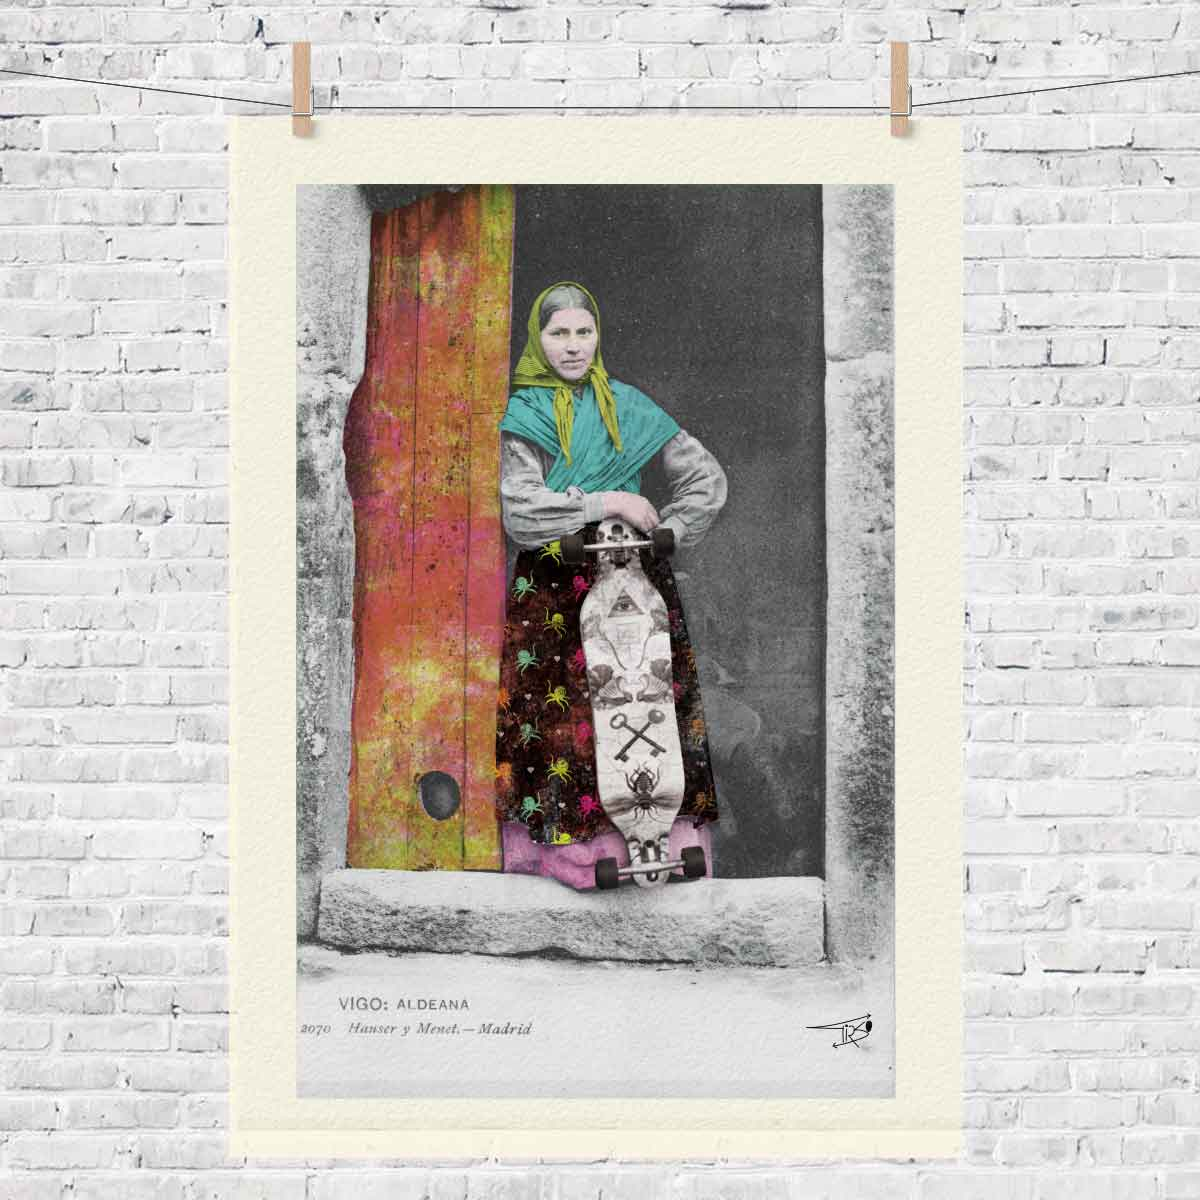 baiona_lamina_camiseta_regalo_mujer_postal_lamina_skate_bayprints_souvenir_shop_tienda_souvenirs_baiona_souvenart_shop